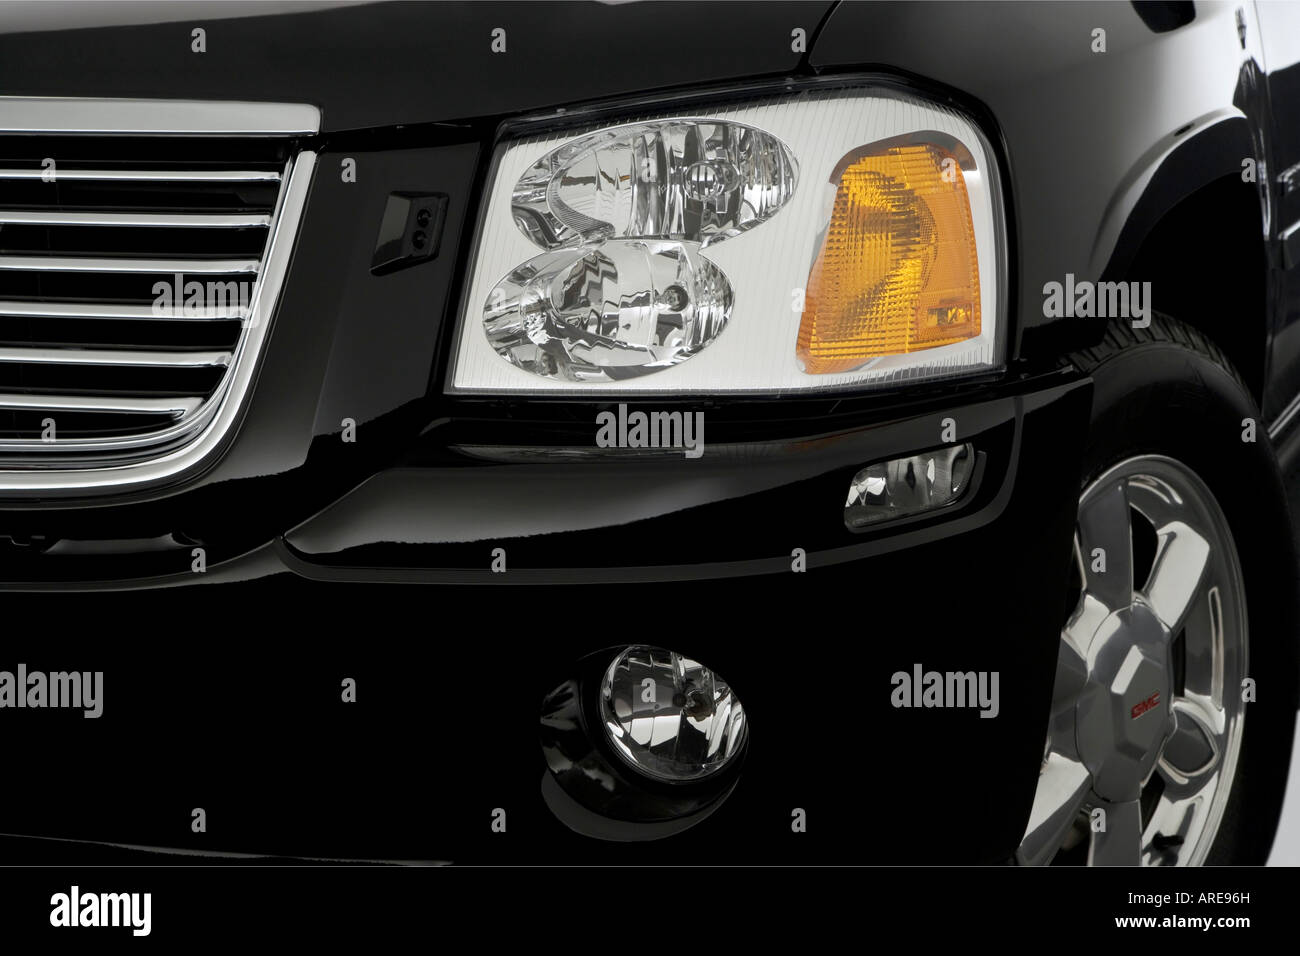 hight resolution of 2006 gmc envoy xl slt in black headlight stock image